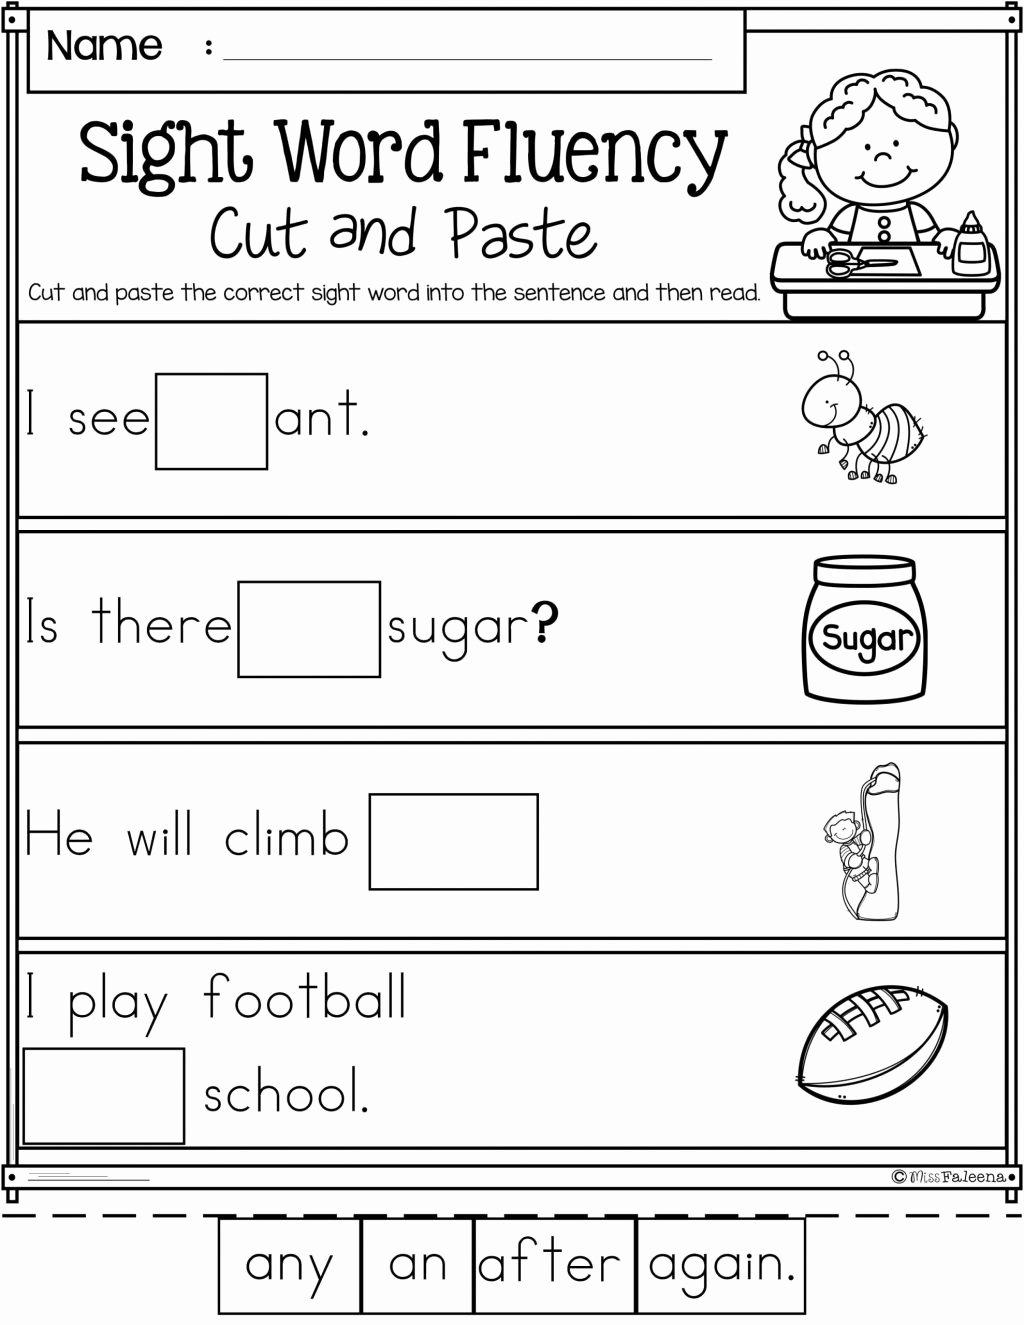 Reading Readiness Worksheets for Preschoolers Fresh Worksheet Kindergarten Skills Worksheets Ideas